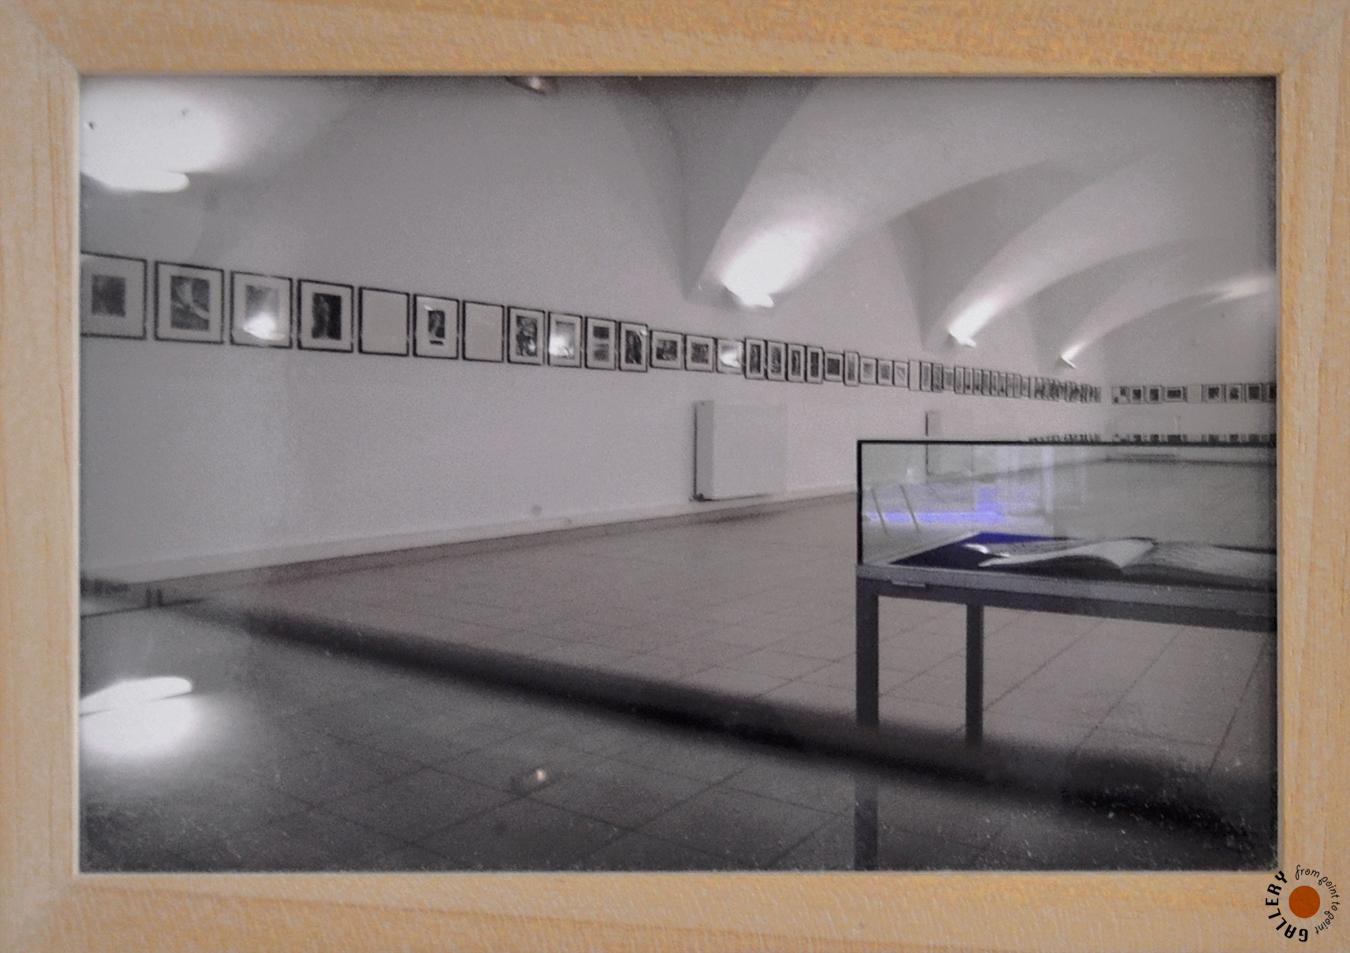 Jean-Suquet-Exposition-Invitation-Exposition-Galerie-Point-to-Point-Studio.jpg